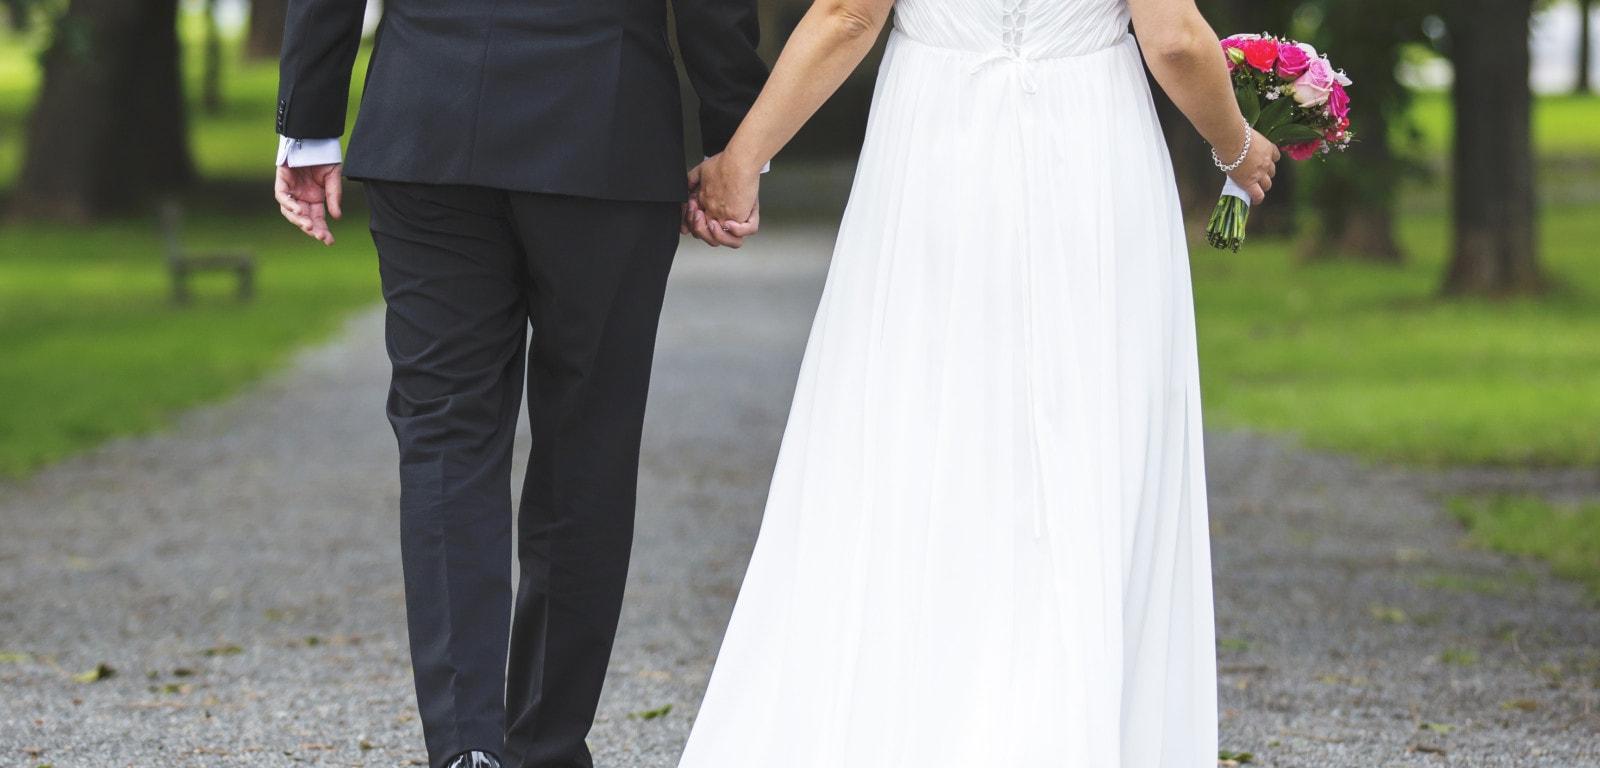 man and woman in wedding attire walking down sidewalk holding hands